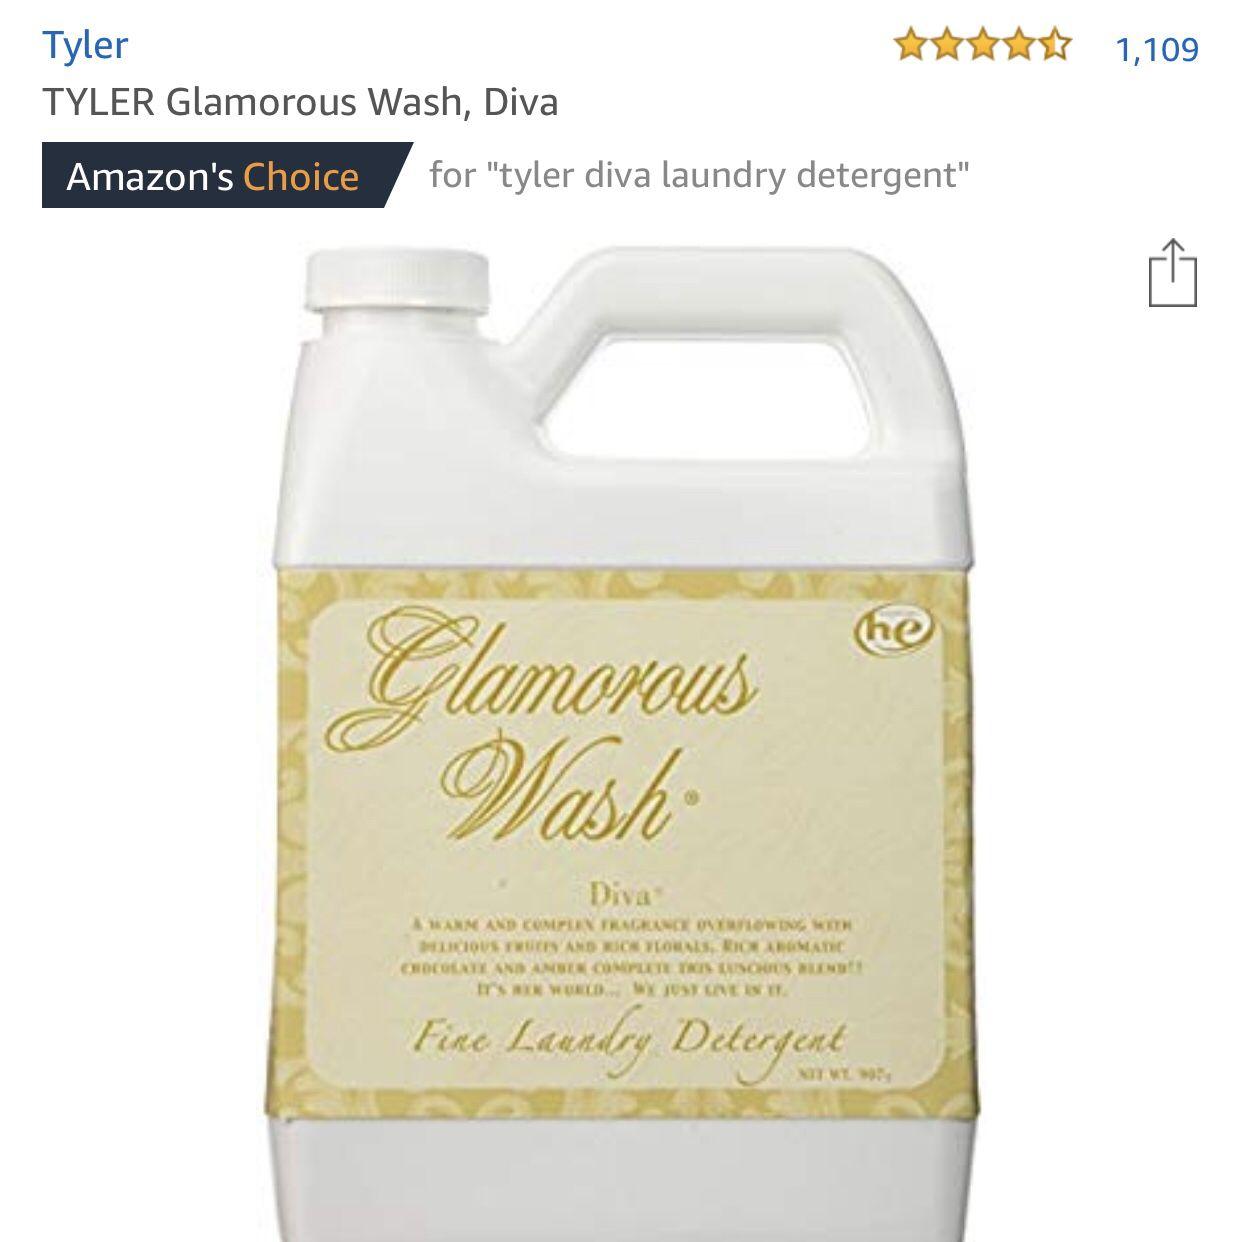 Pin By Tara Vinson On Amazon Loves Laundry Detergent Diva